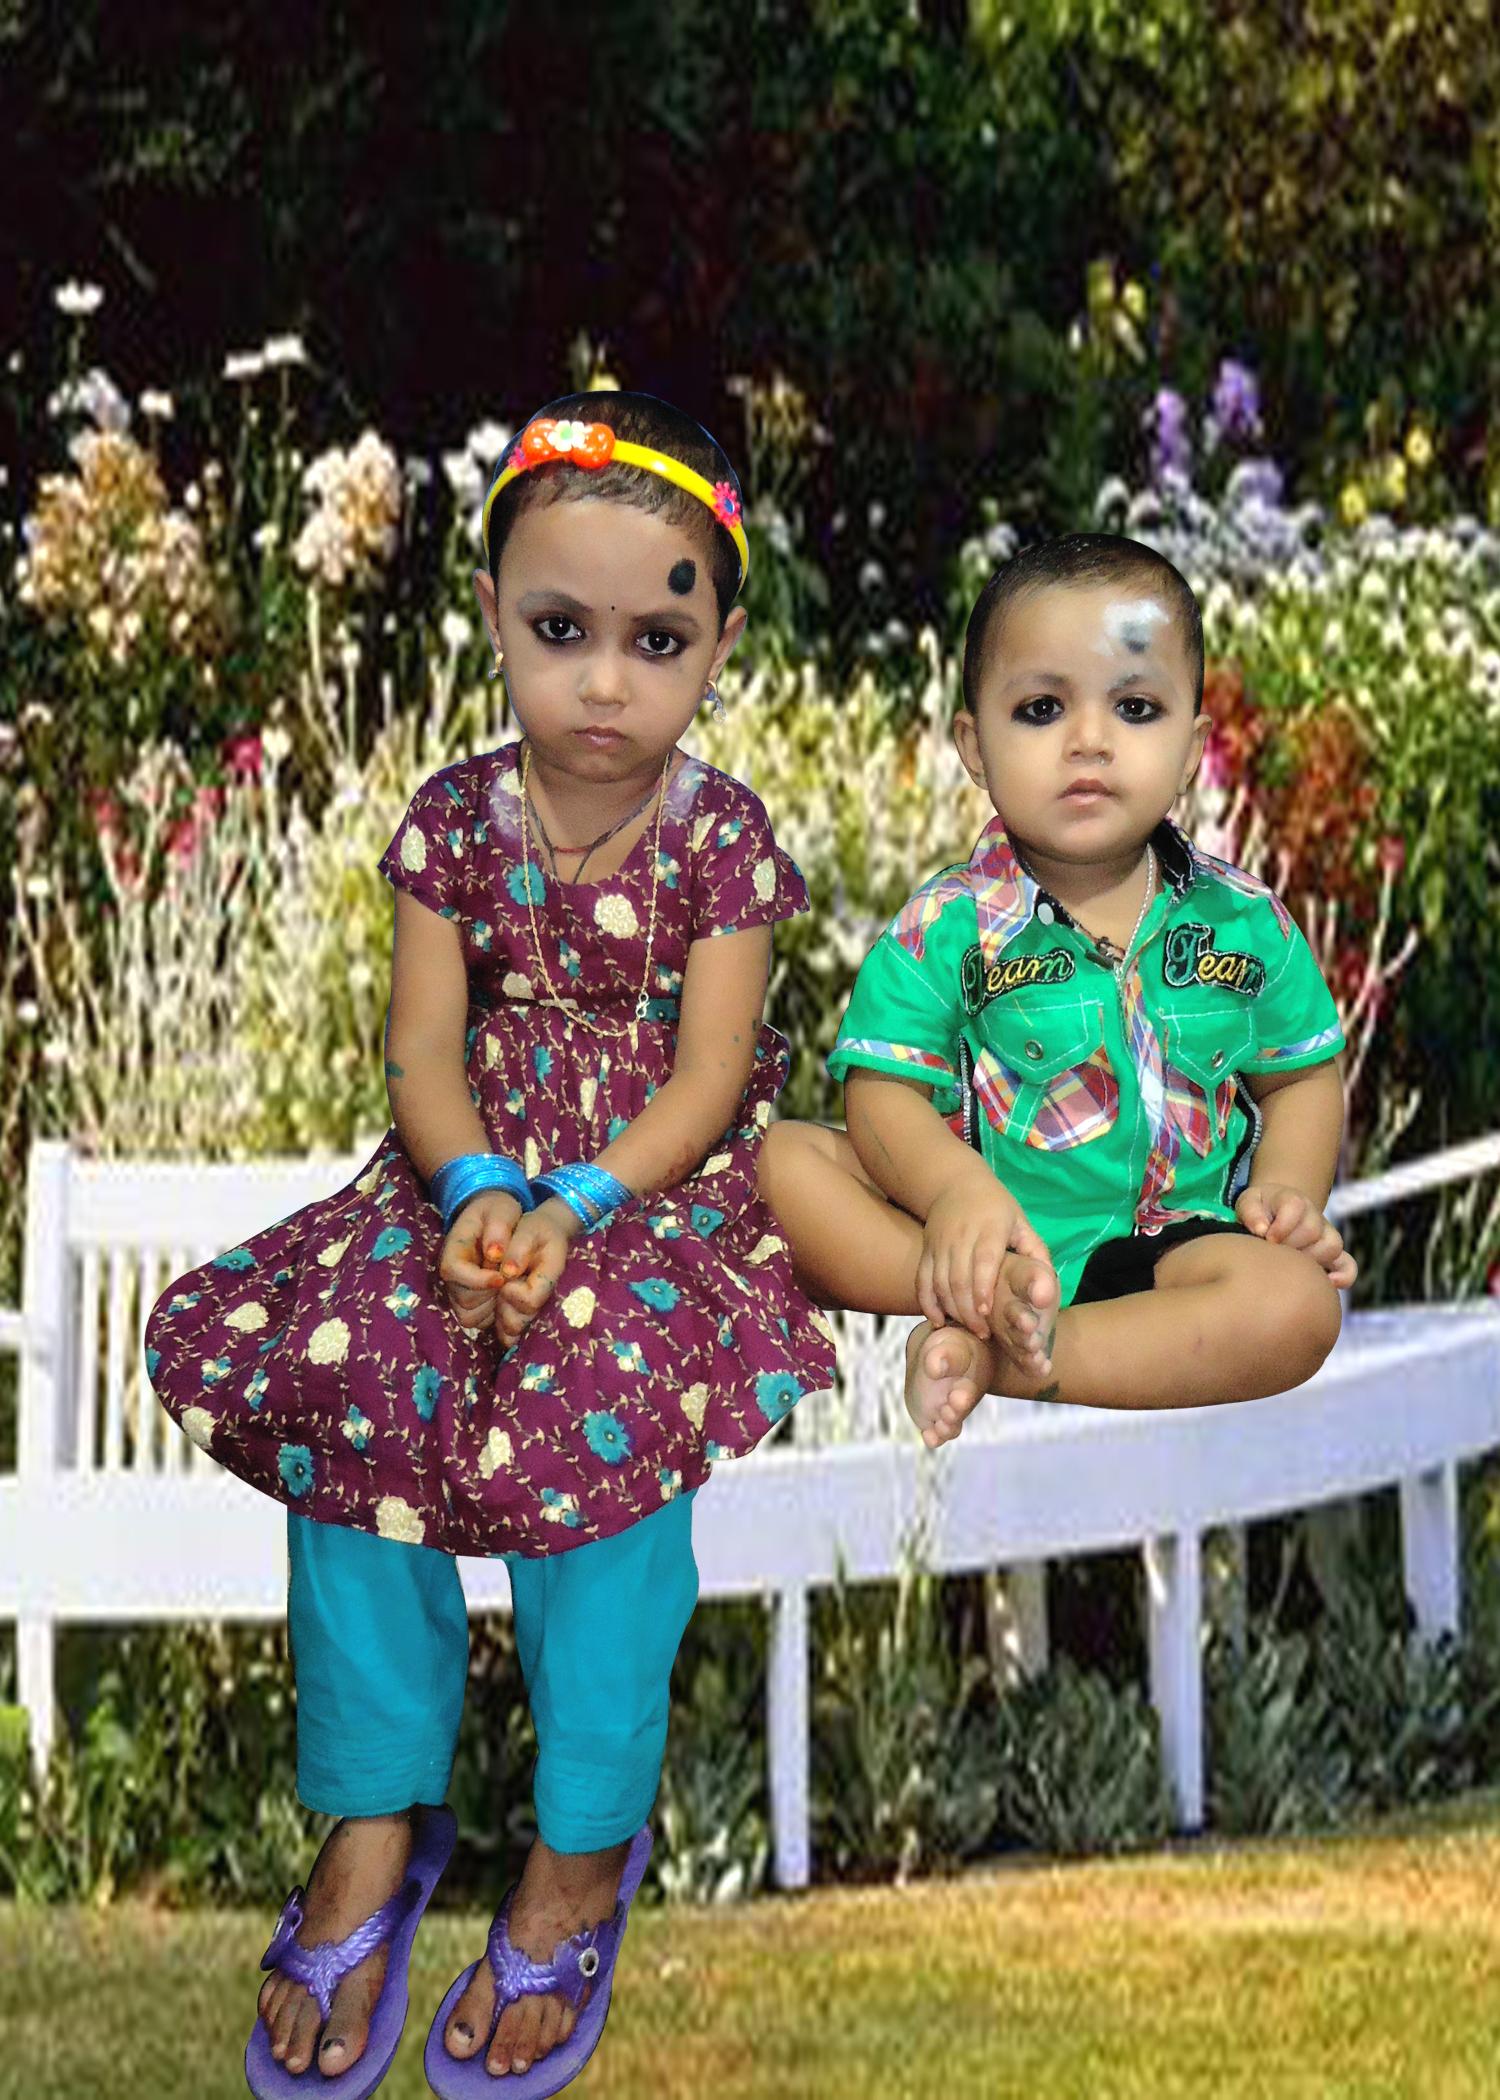 abu taher00 Profile Picture